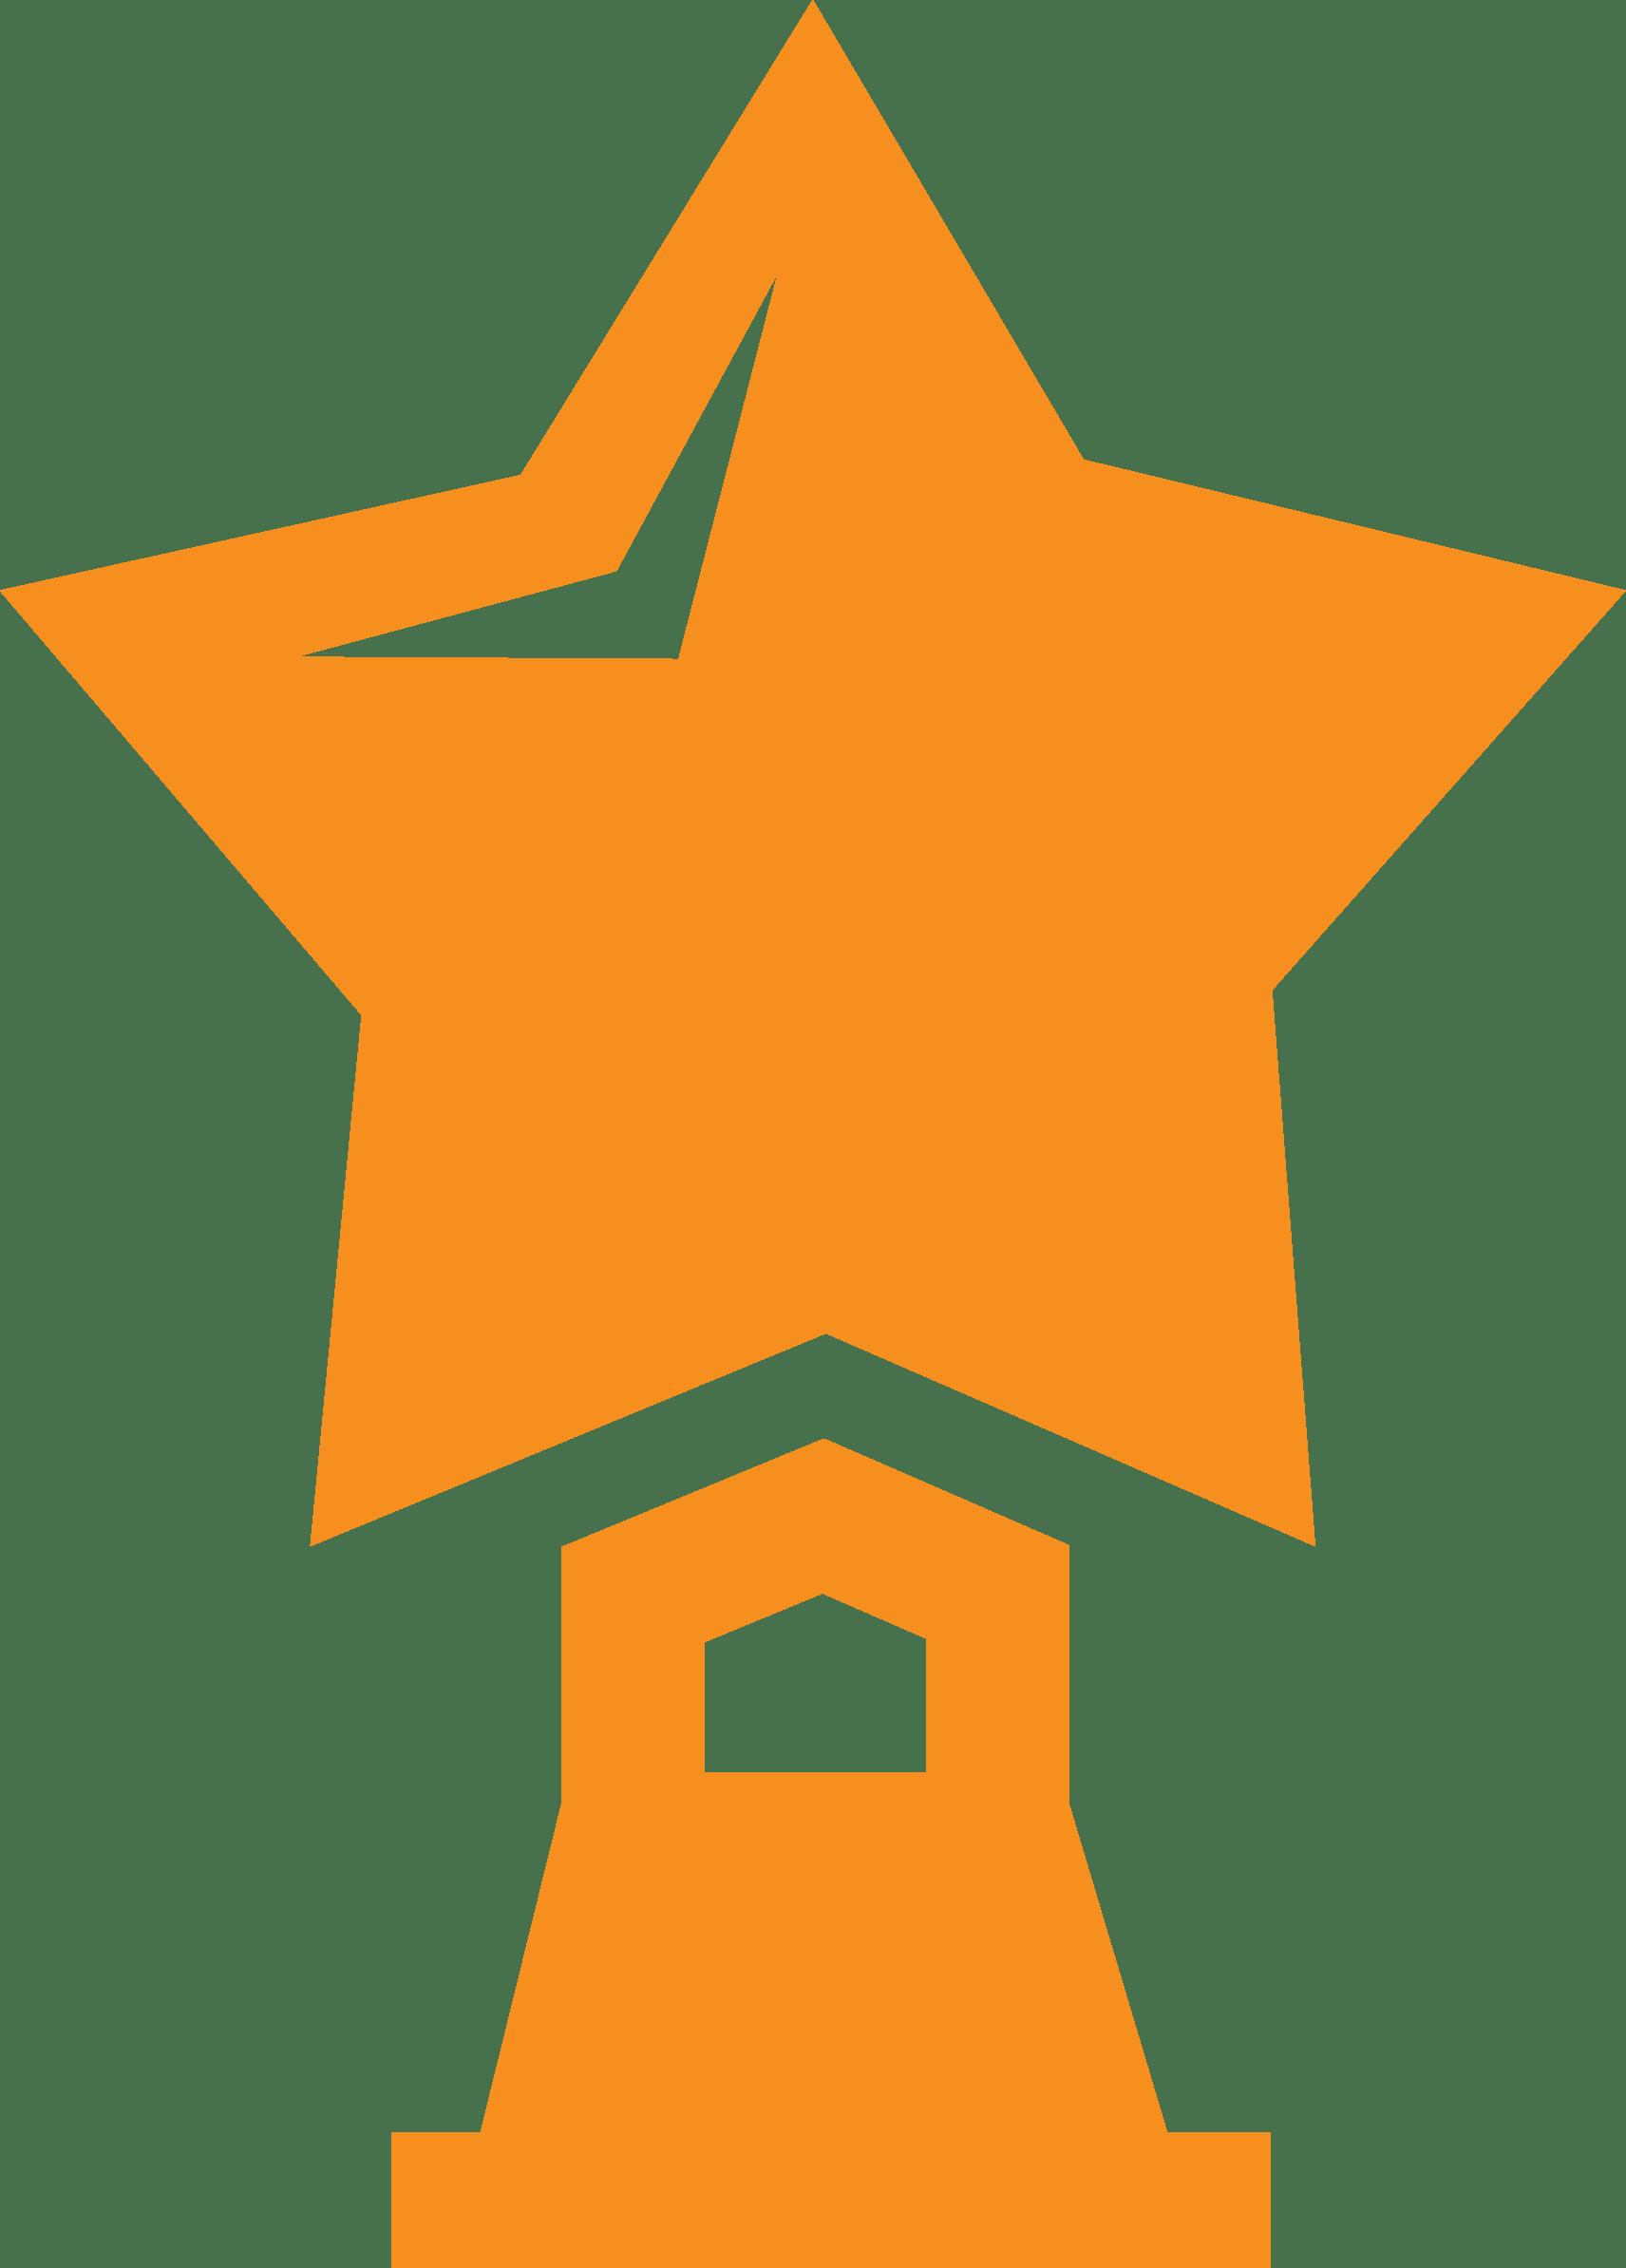 Star award clipart clipart royalty free download award   WakeEd Partnership clipart royalty free download